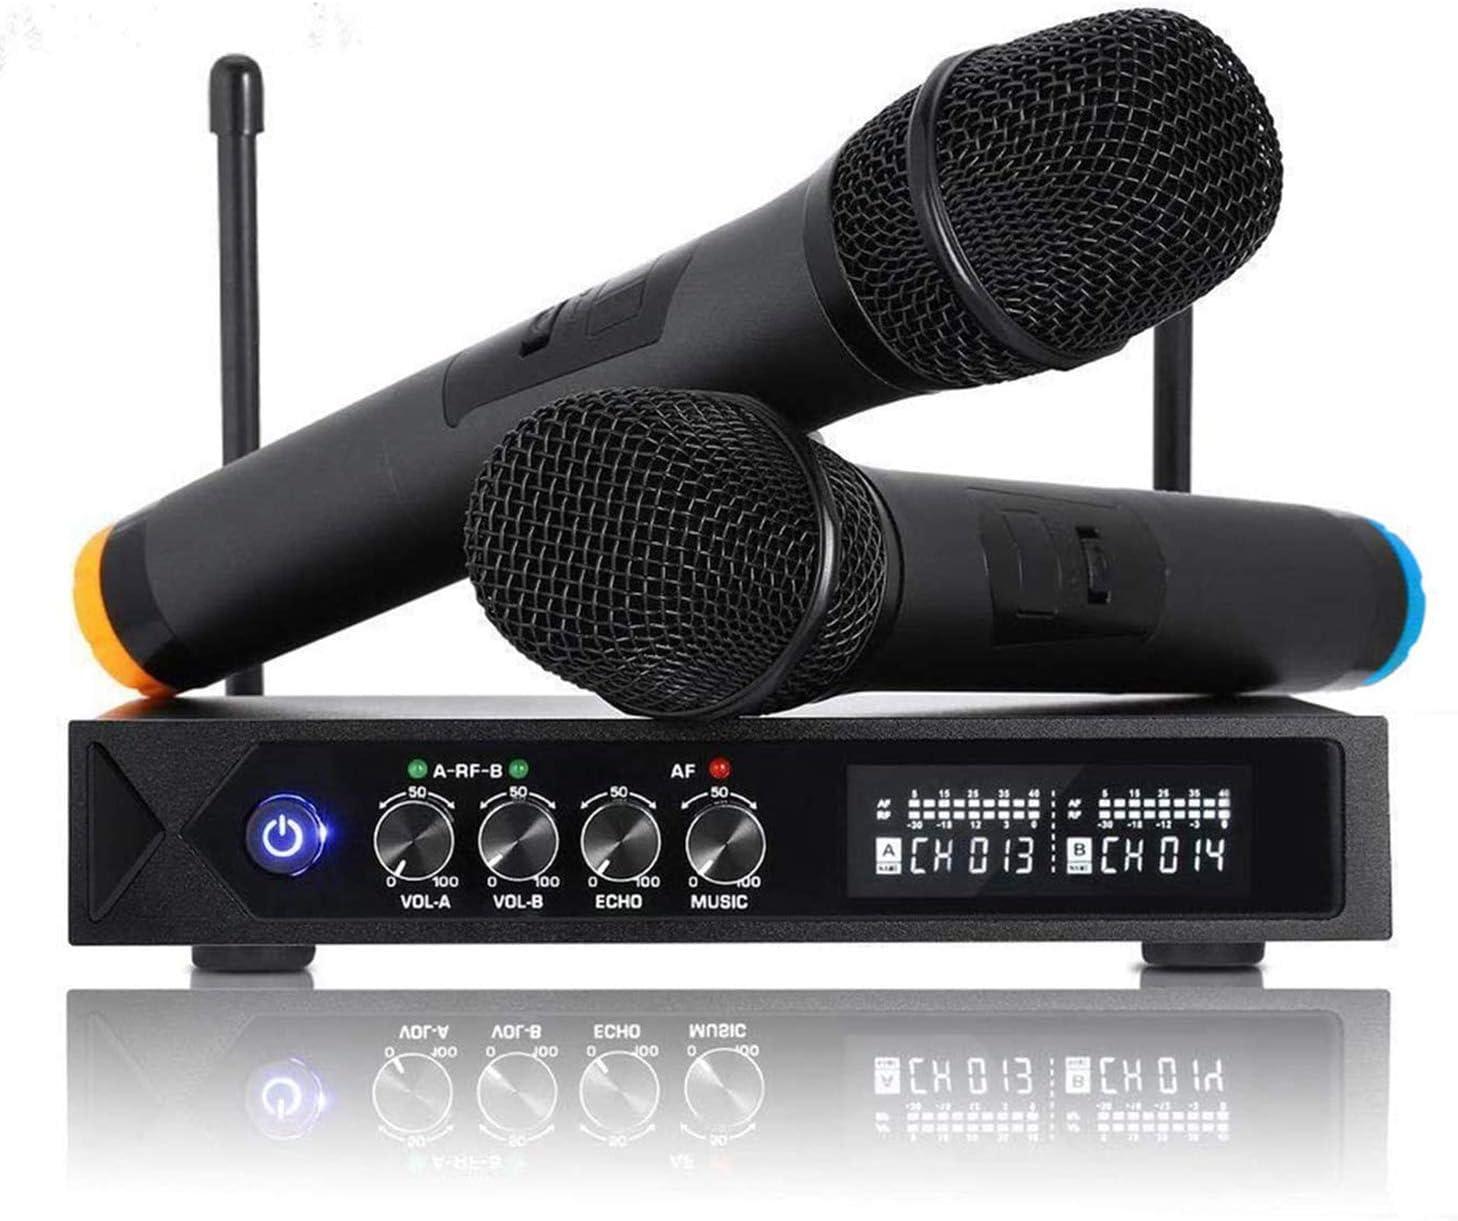 Roxtak Micrófono Karaoke Bluetooth, UHF Micrófonos Inalámbrico Profesional Portátil, Receptor de Micrófono Dual con Pantalla LCD para Fiesta de Karaoke, KTV, Lugares de Entretenimiento, Boda y Reunión